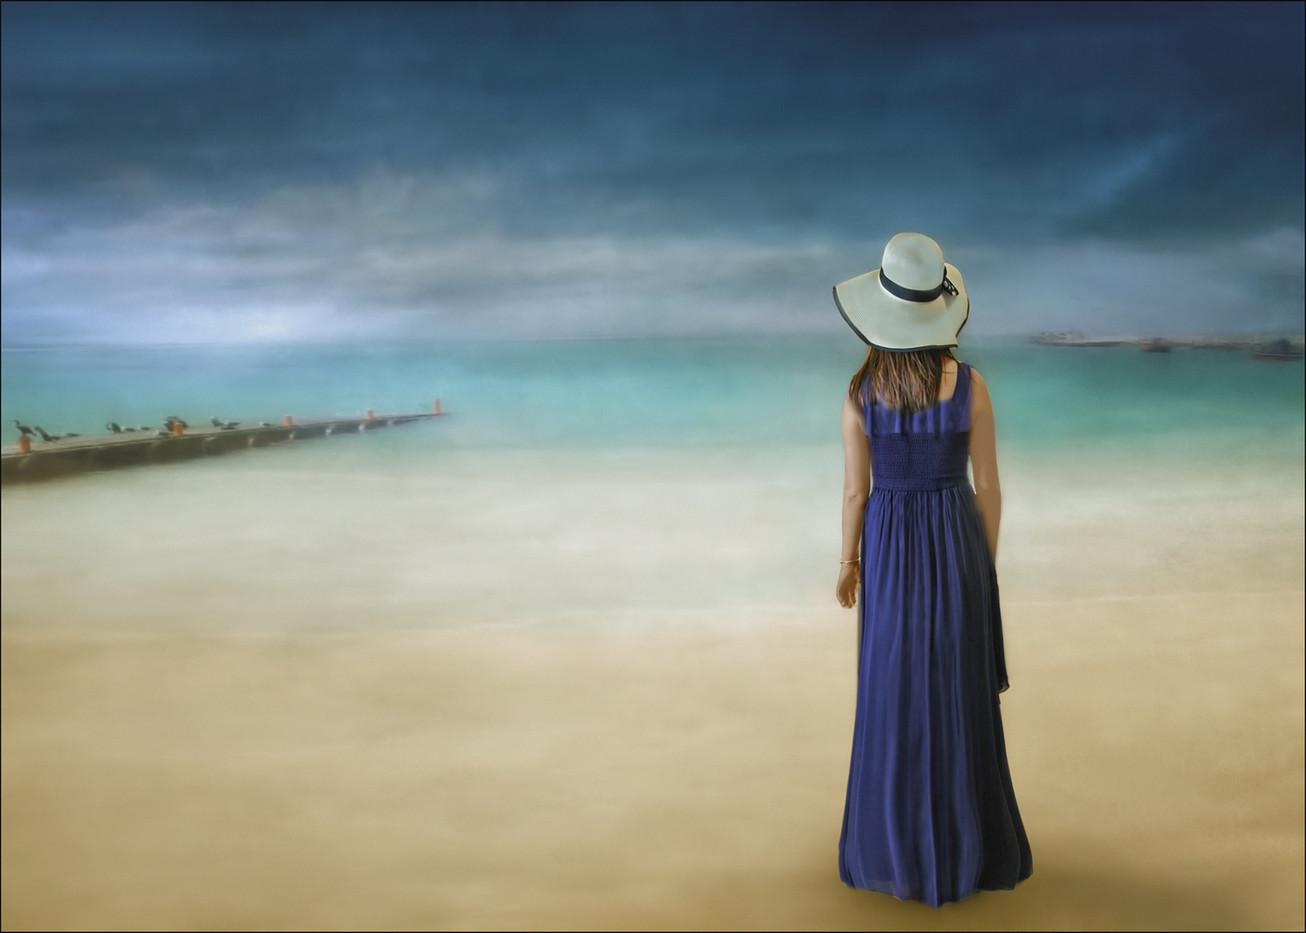 16 SUMMER STORM APPROACHING by Pam Sherren